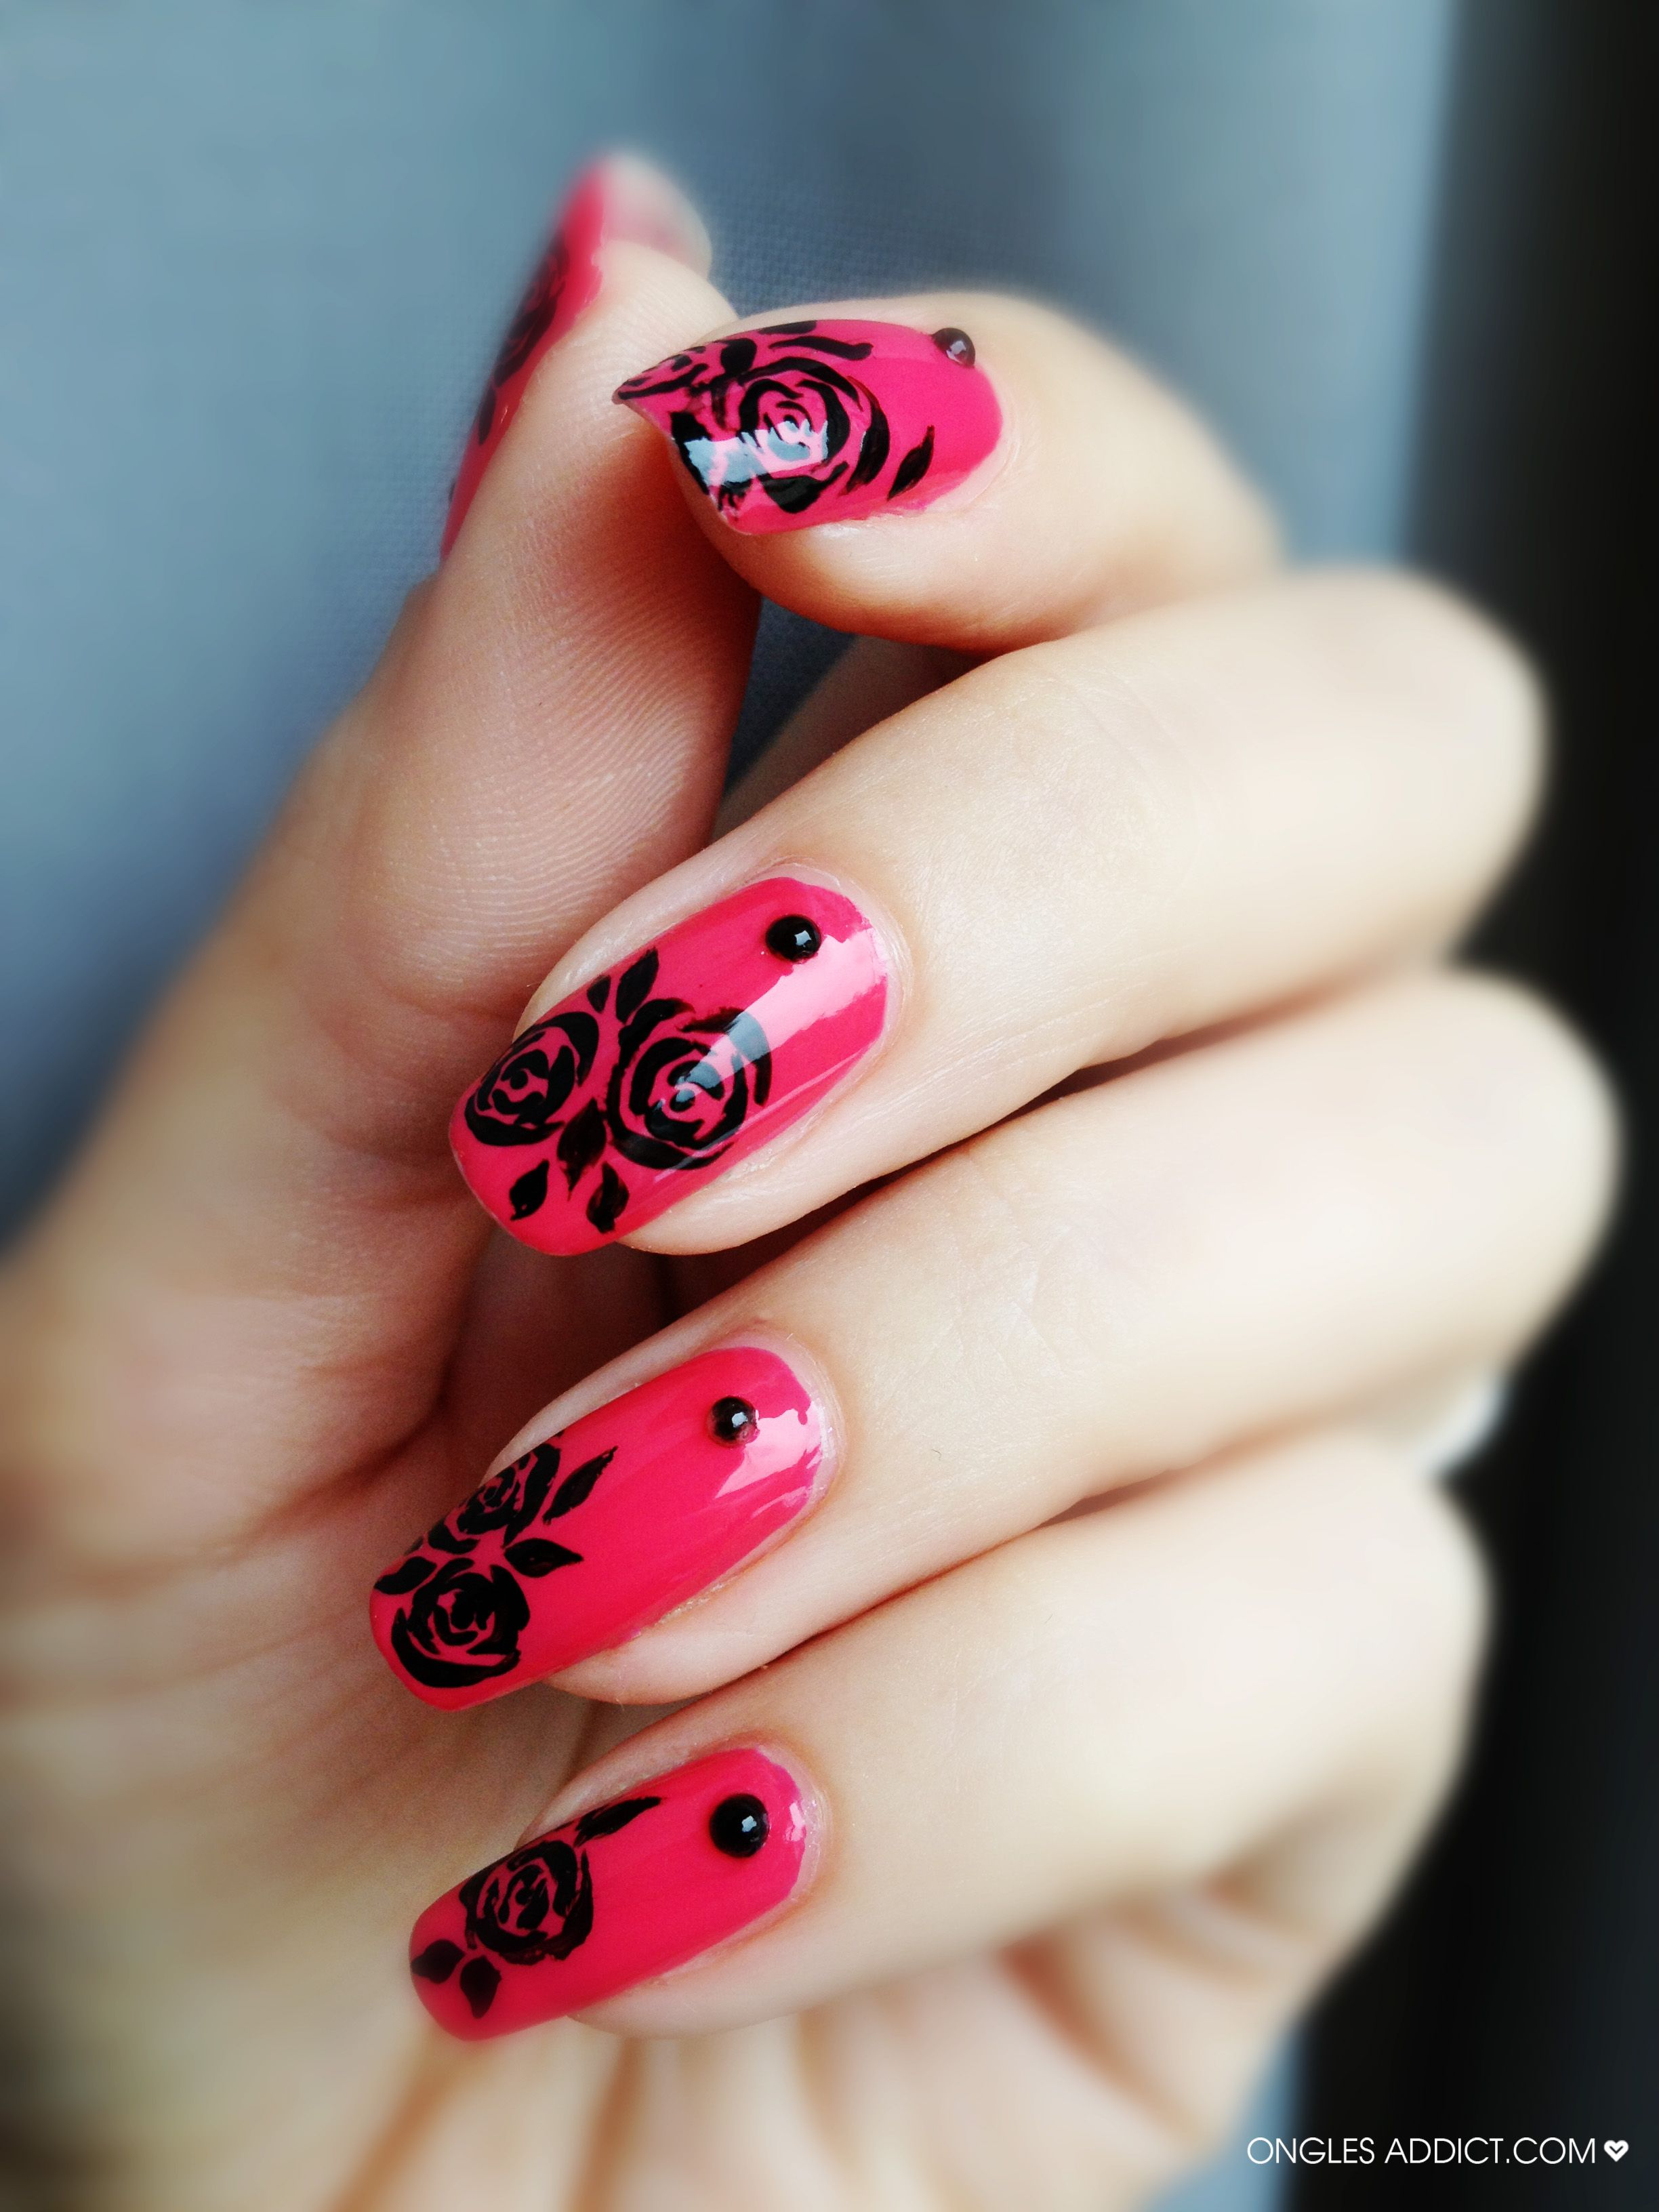 Black Roses Nail Art Ongles Addict Fancy Nails Pinterest